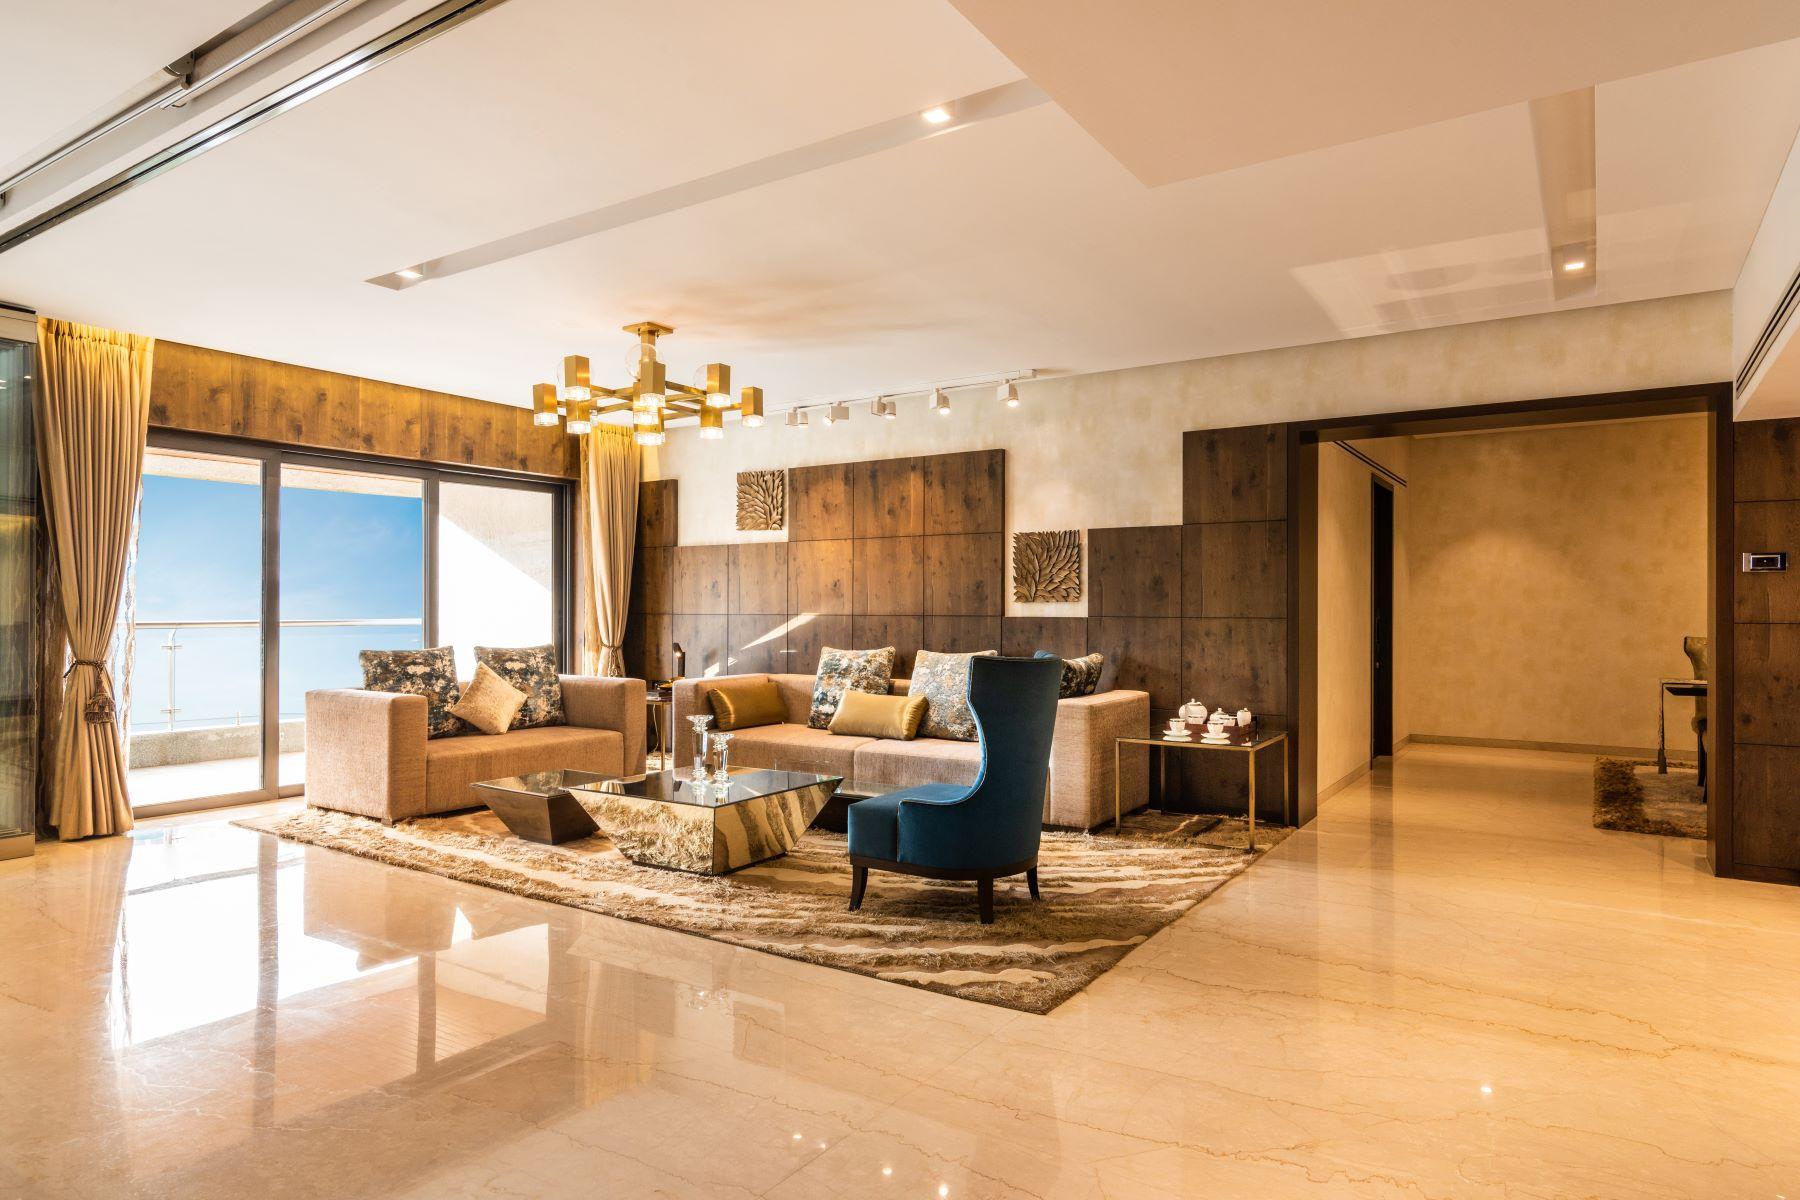 Apartments for Sale at Signia Isles, Bandra Kurla Complex Mumbai, Maharashtra 400051 India